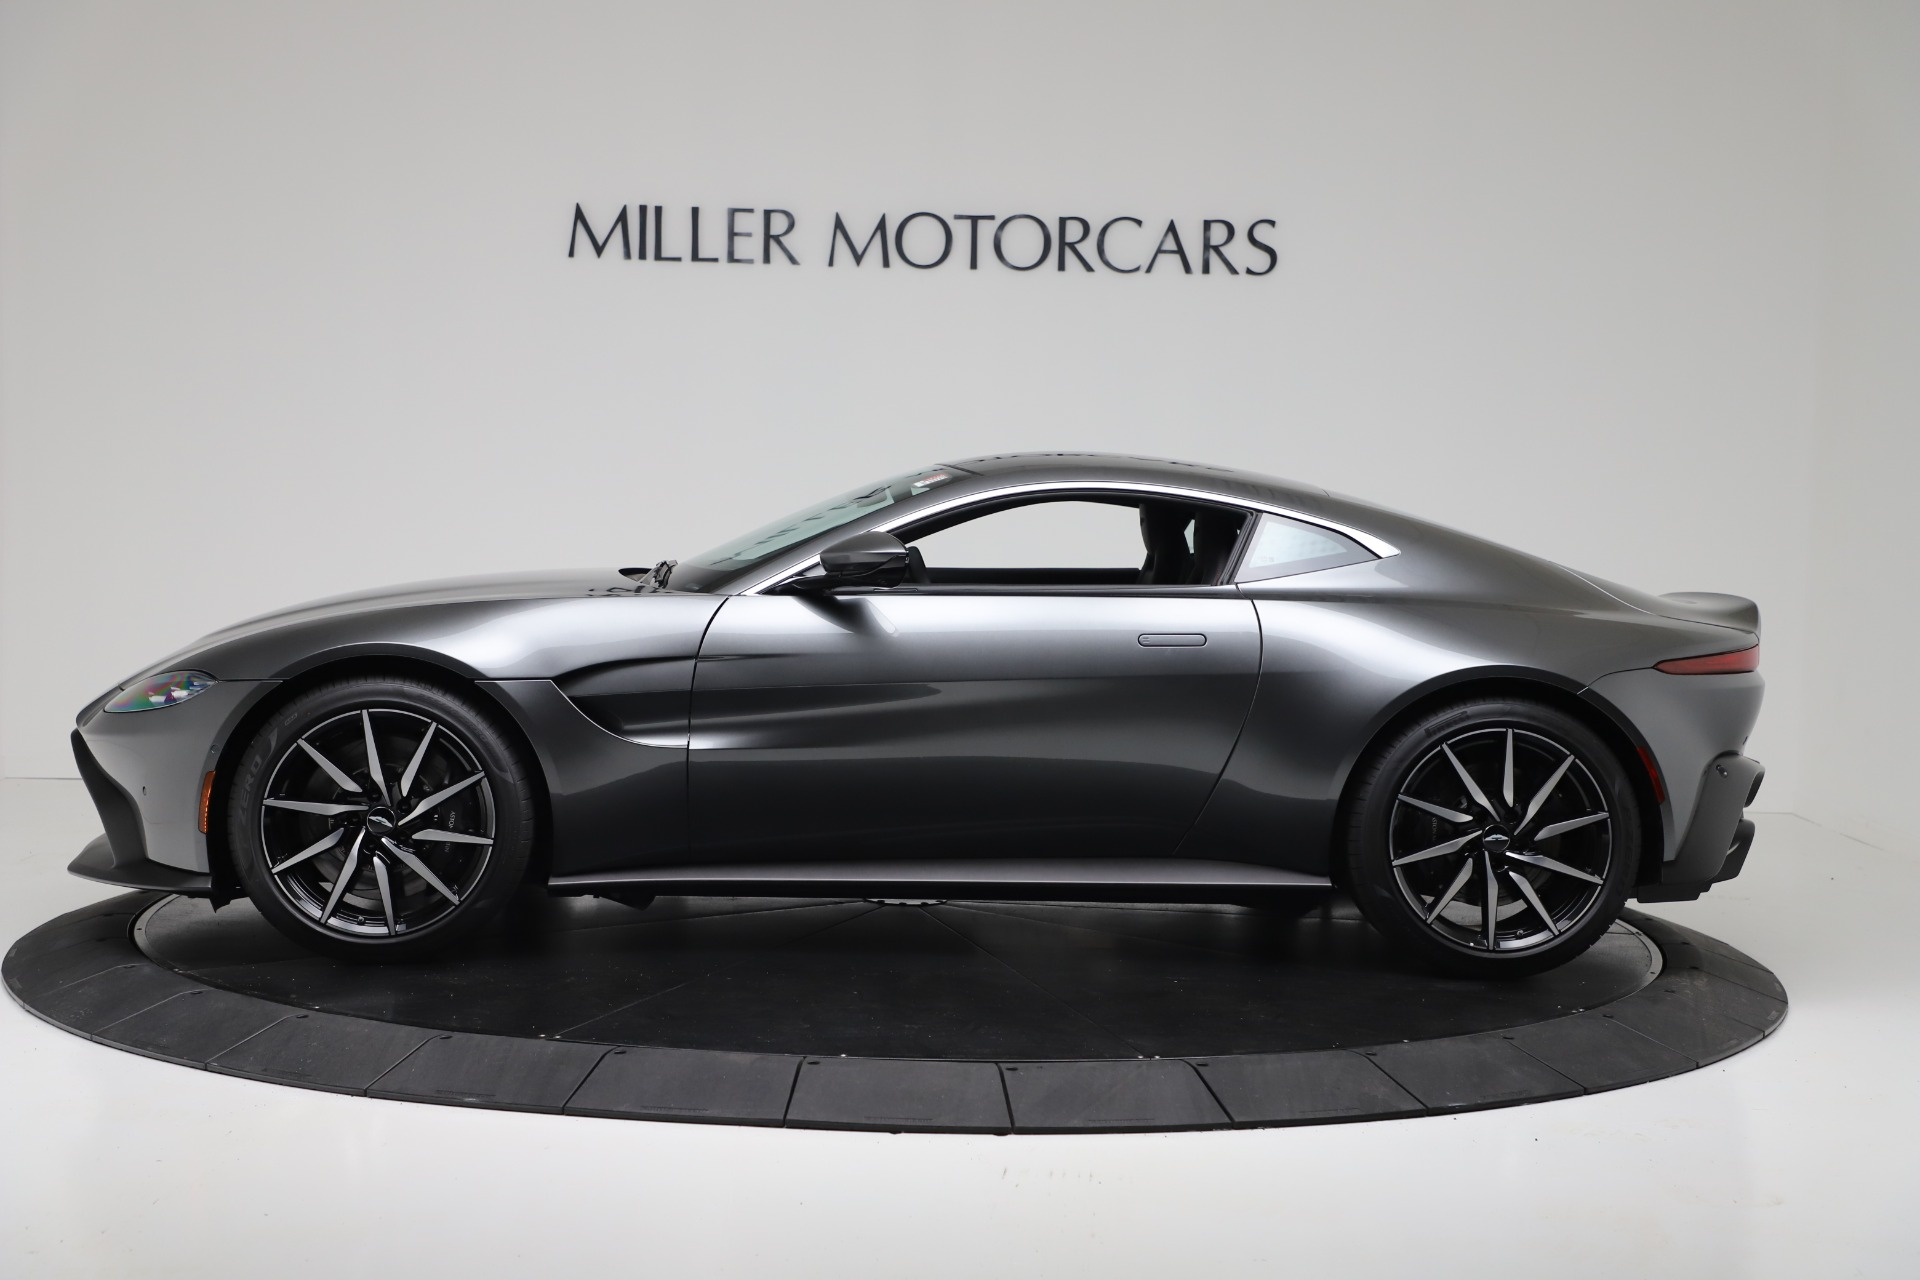 New 2020 Aston Martin Vantage V8 For Sale In Greenwich, CT 3384_p2